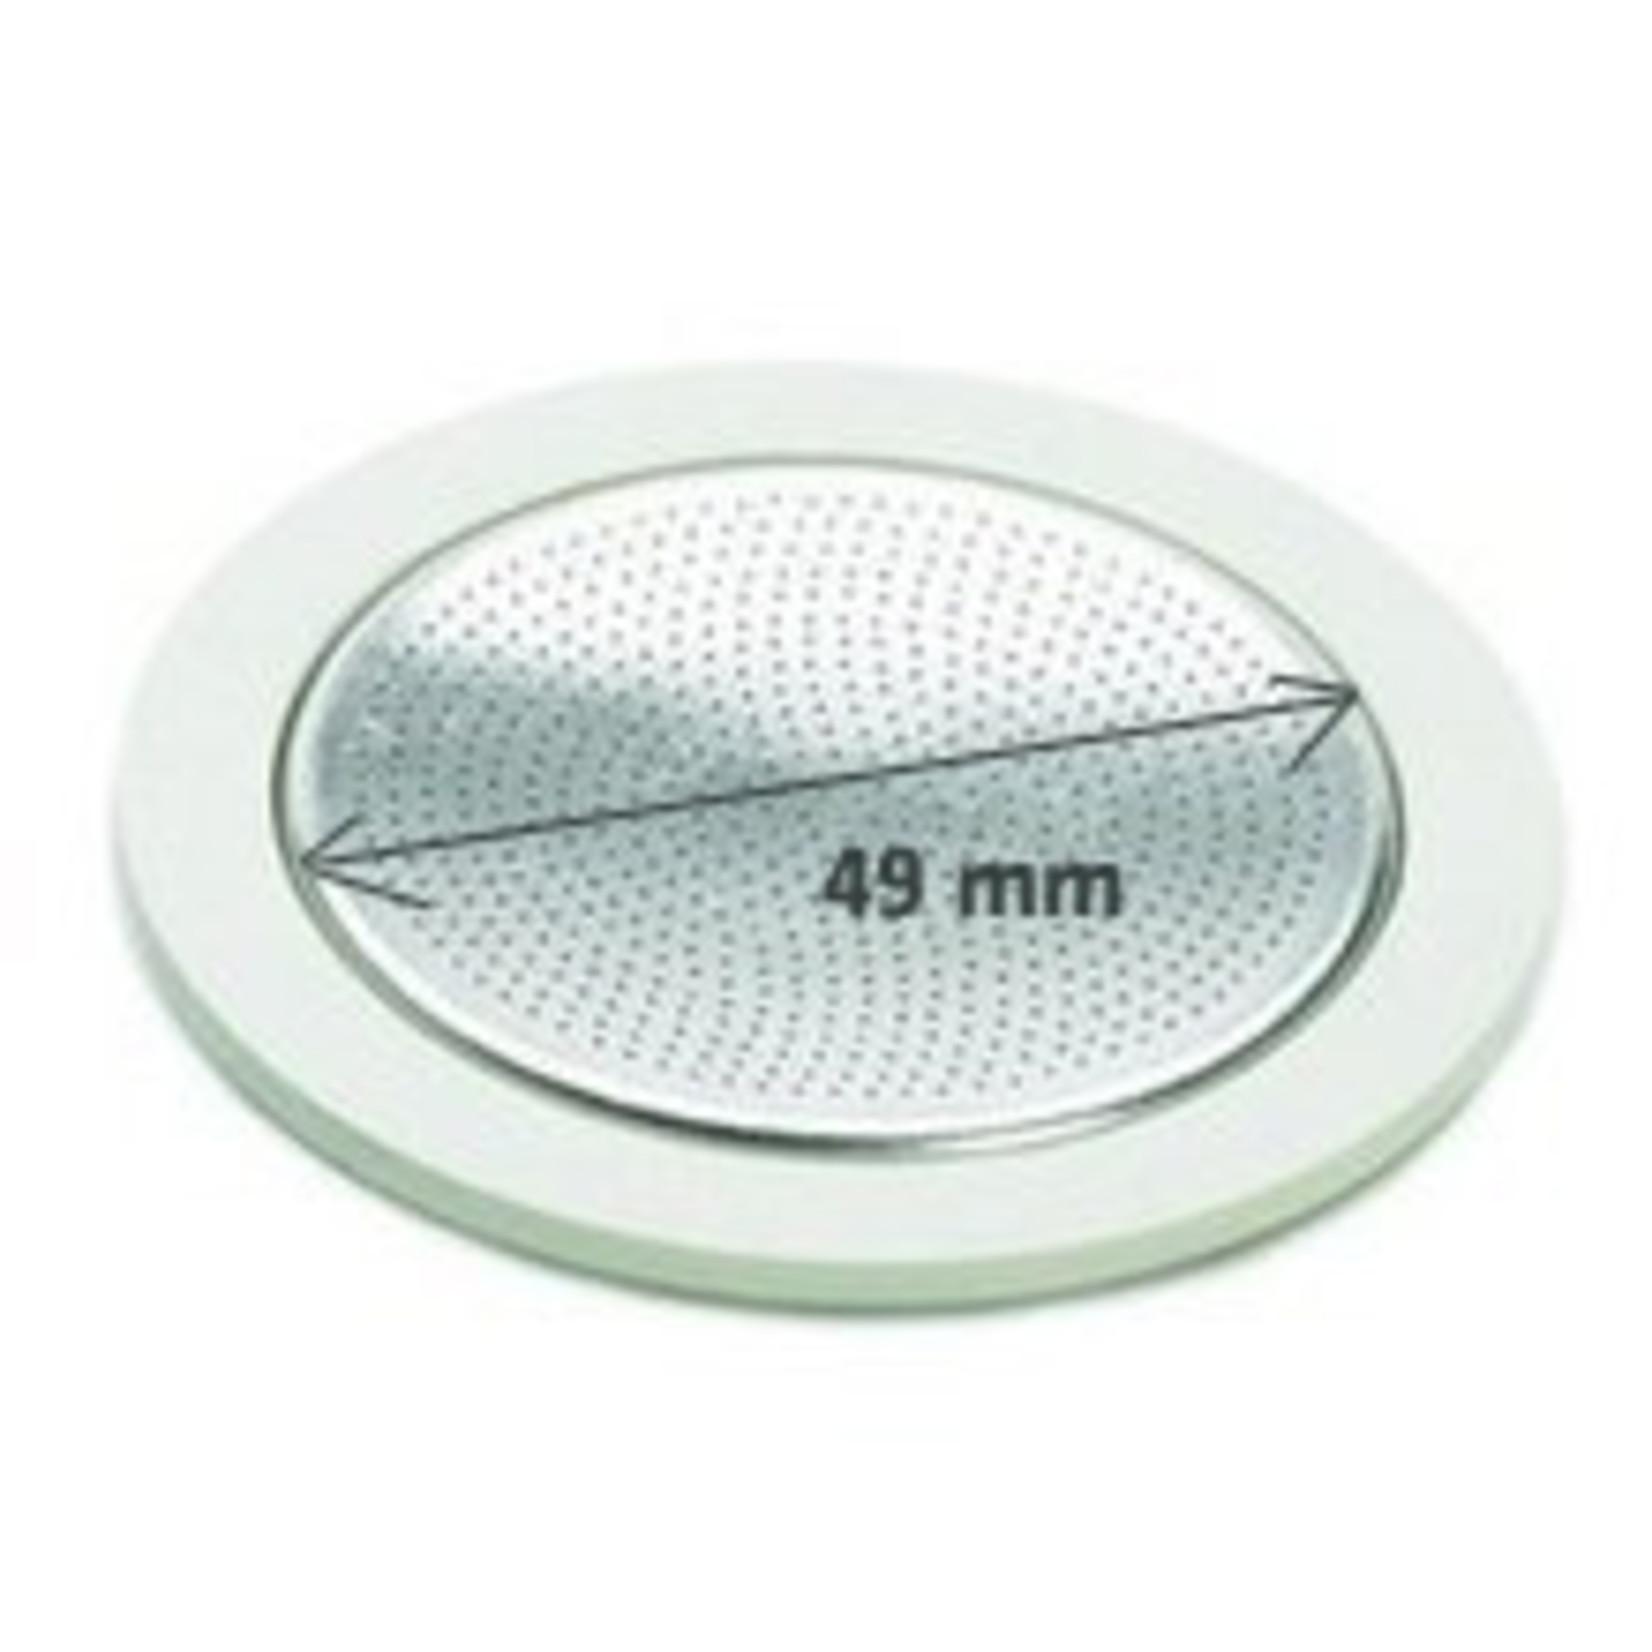 Bialetti Bialetti filterplaatje met rubberen ringen 3 en 4 kops aluminium